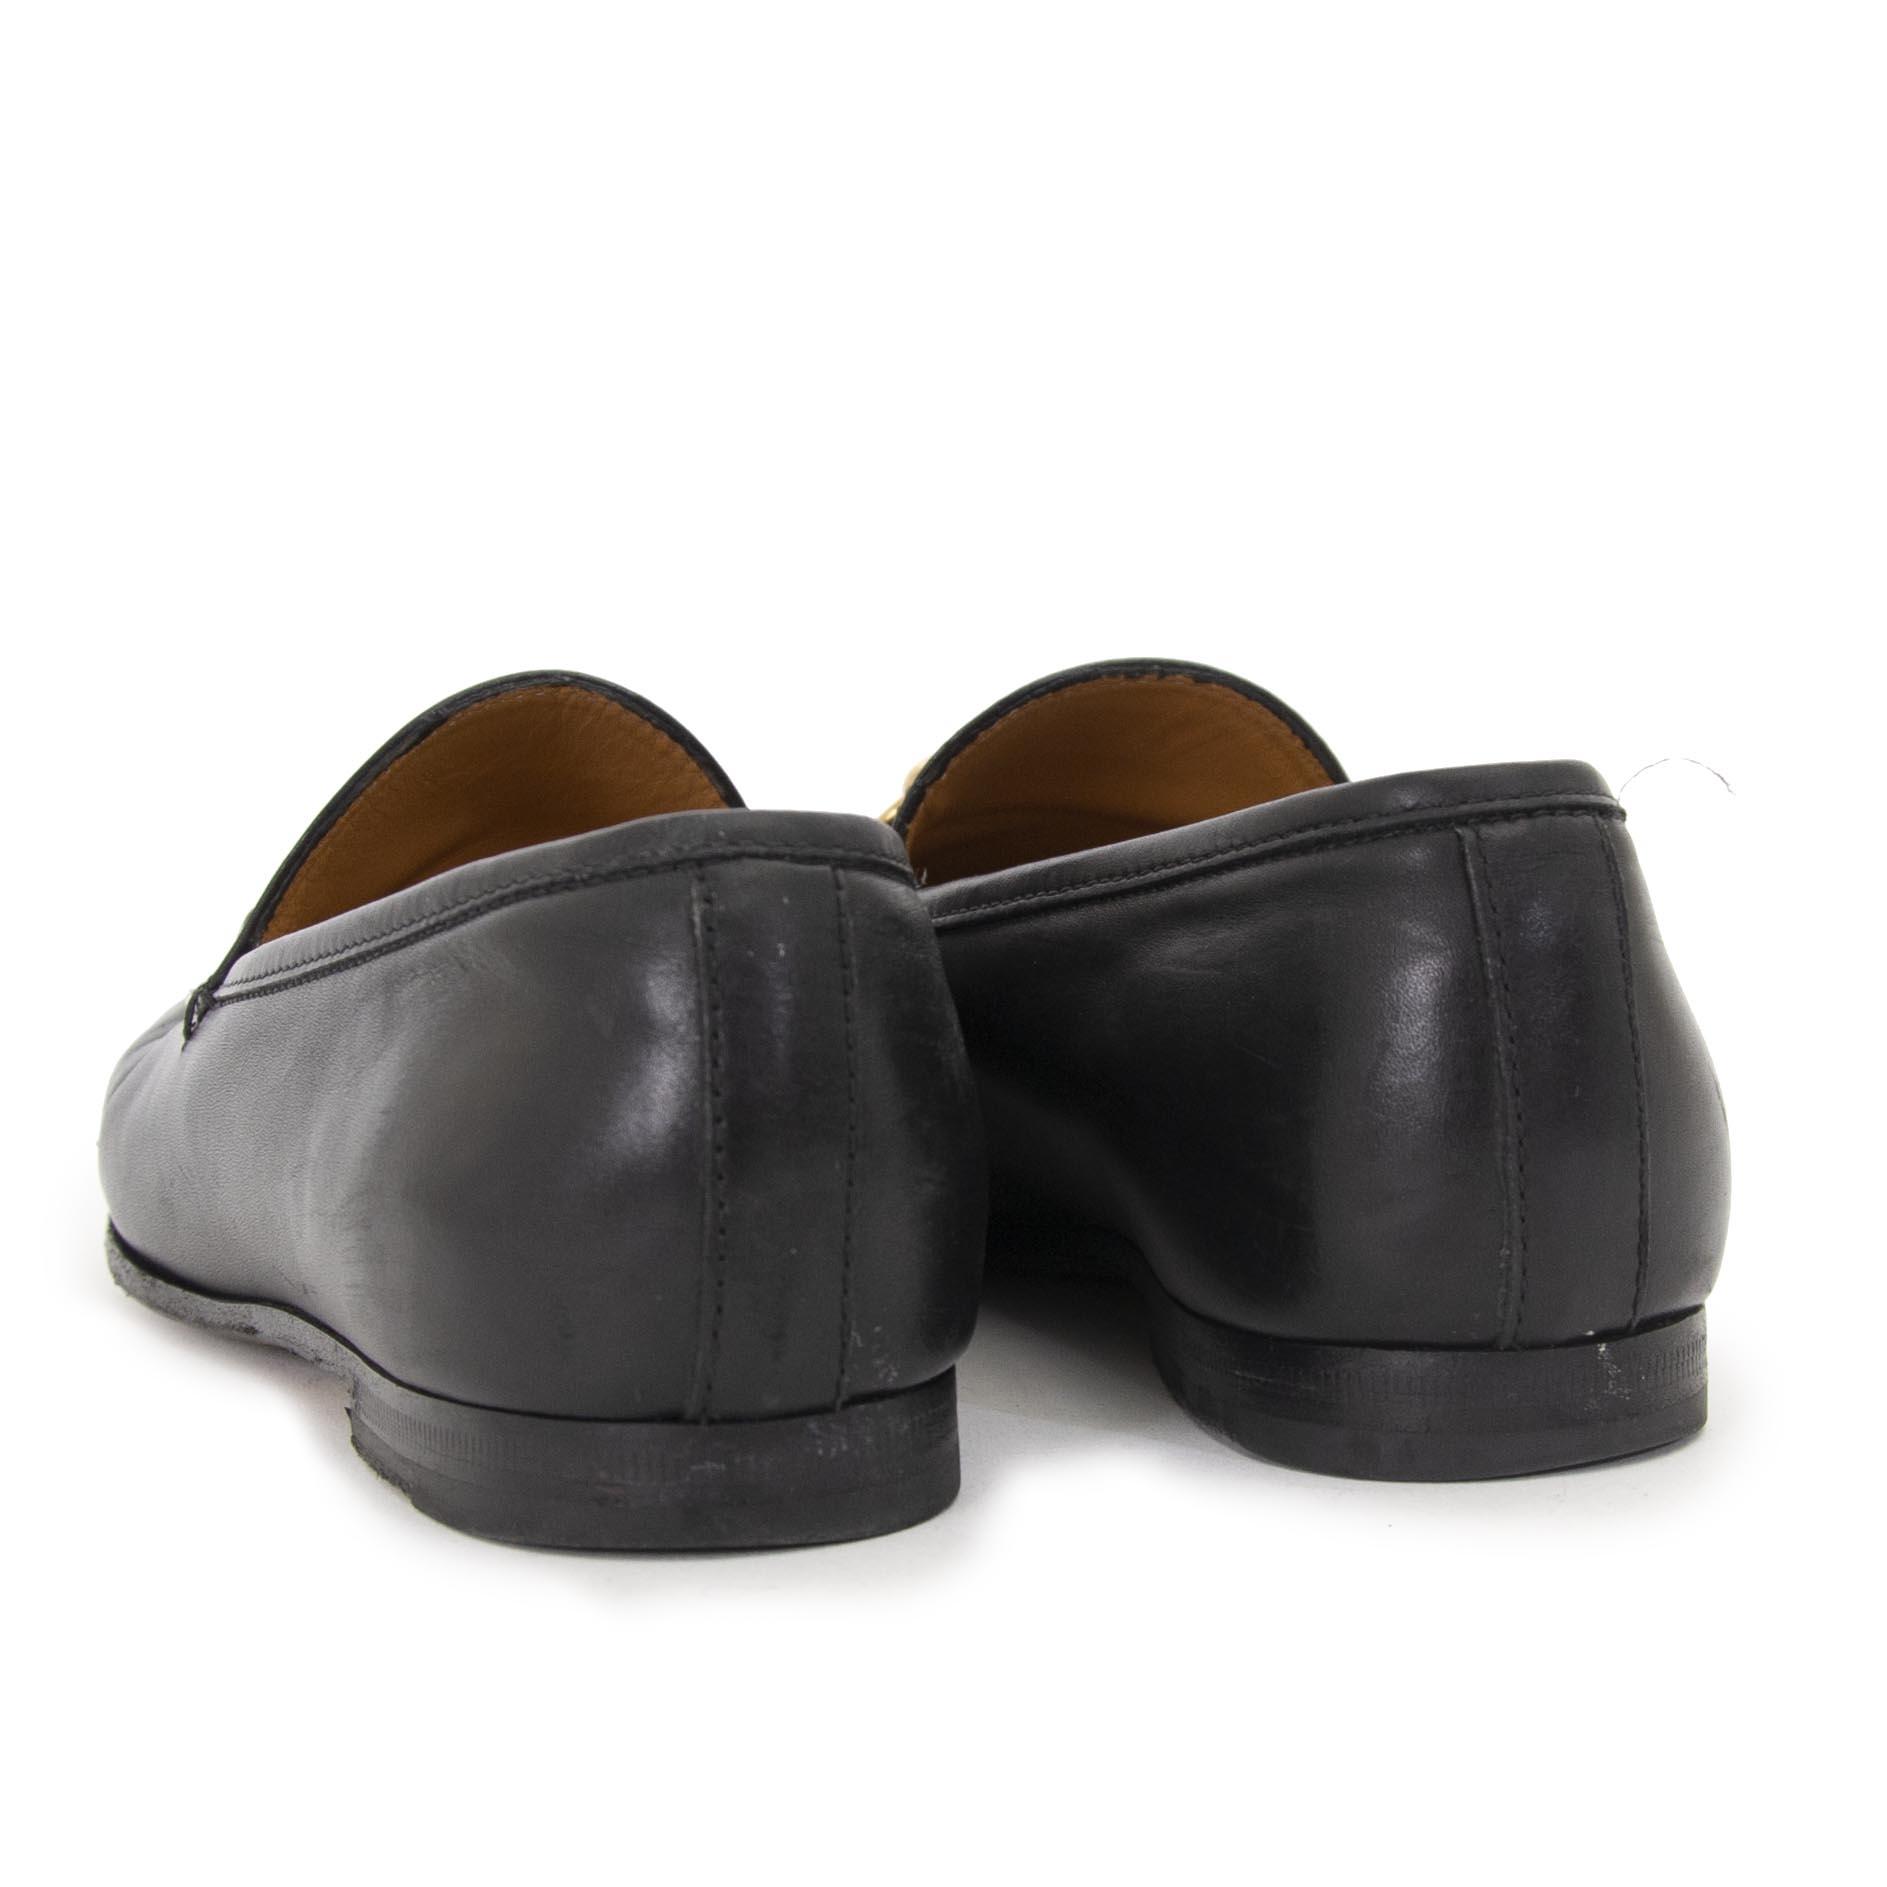 94c998f01714 ... sale at labellov vintage fashion webshop belgium Gucci jordaan loafer  nu te koop bij labellov vintage mode webshop belgië